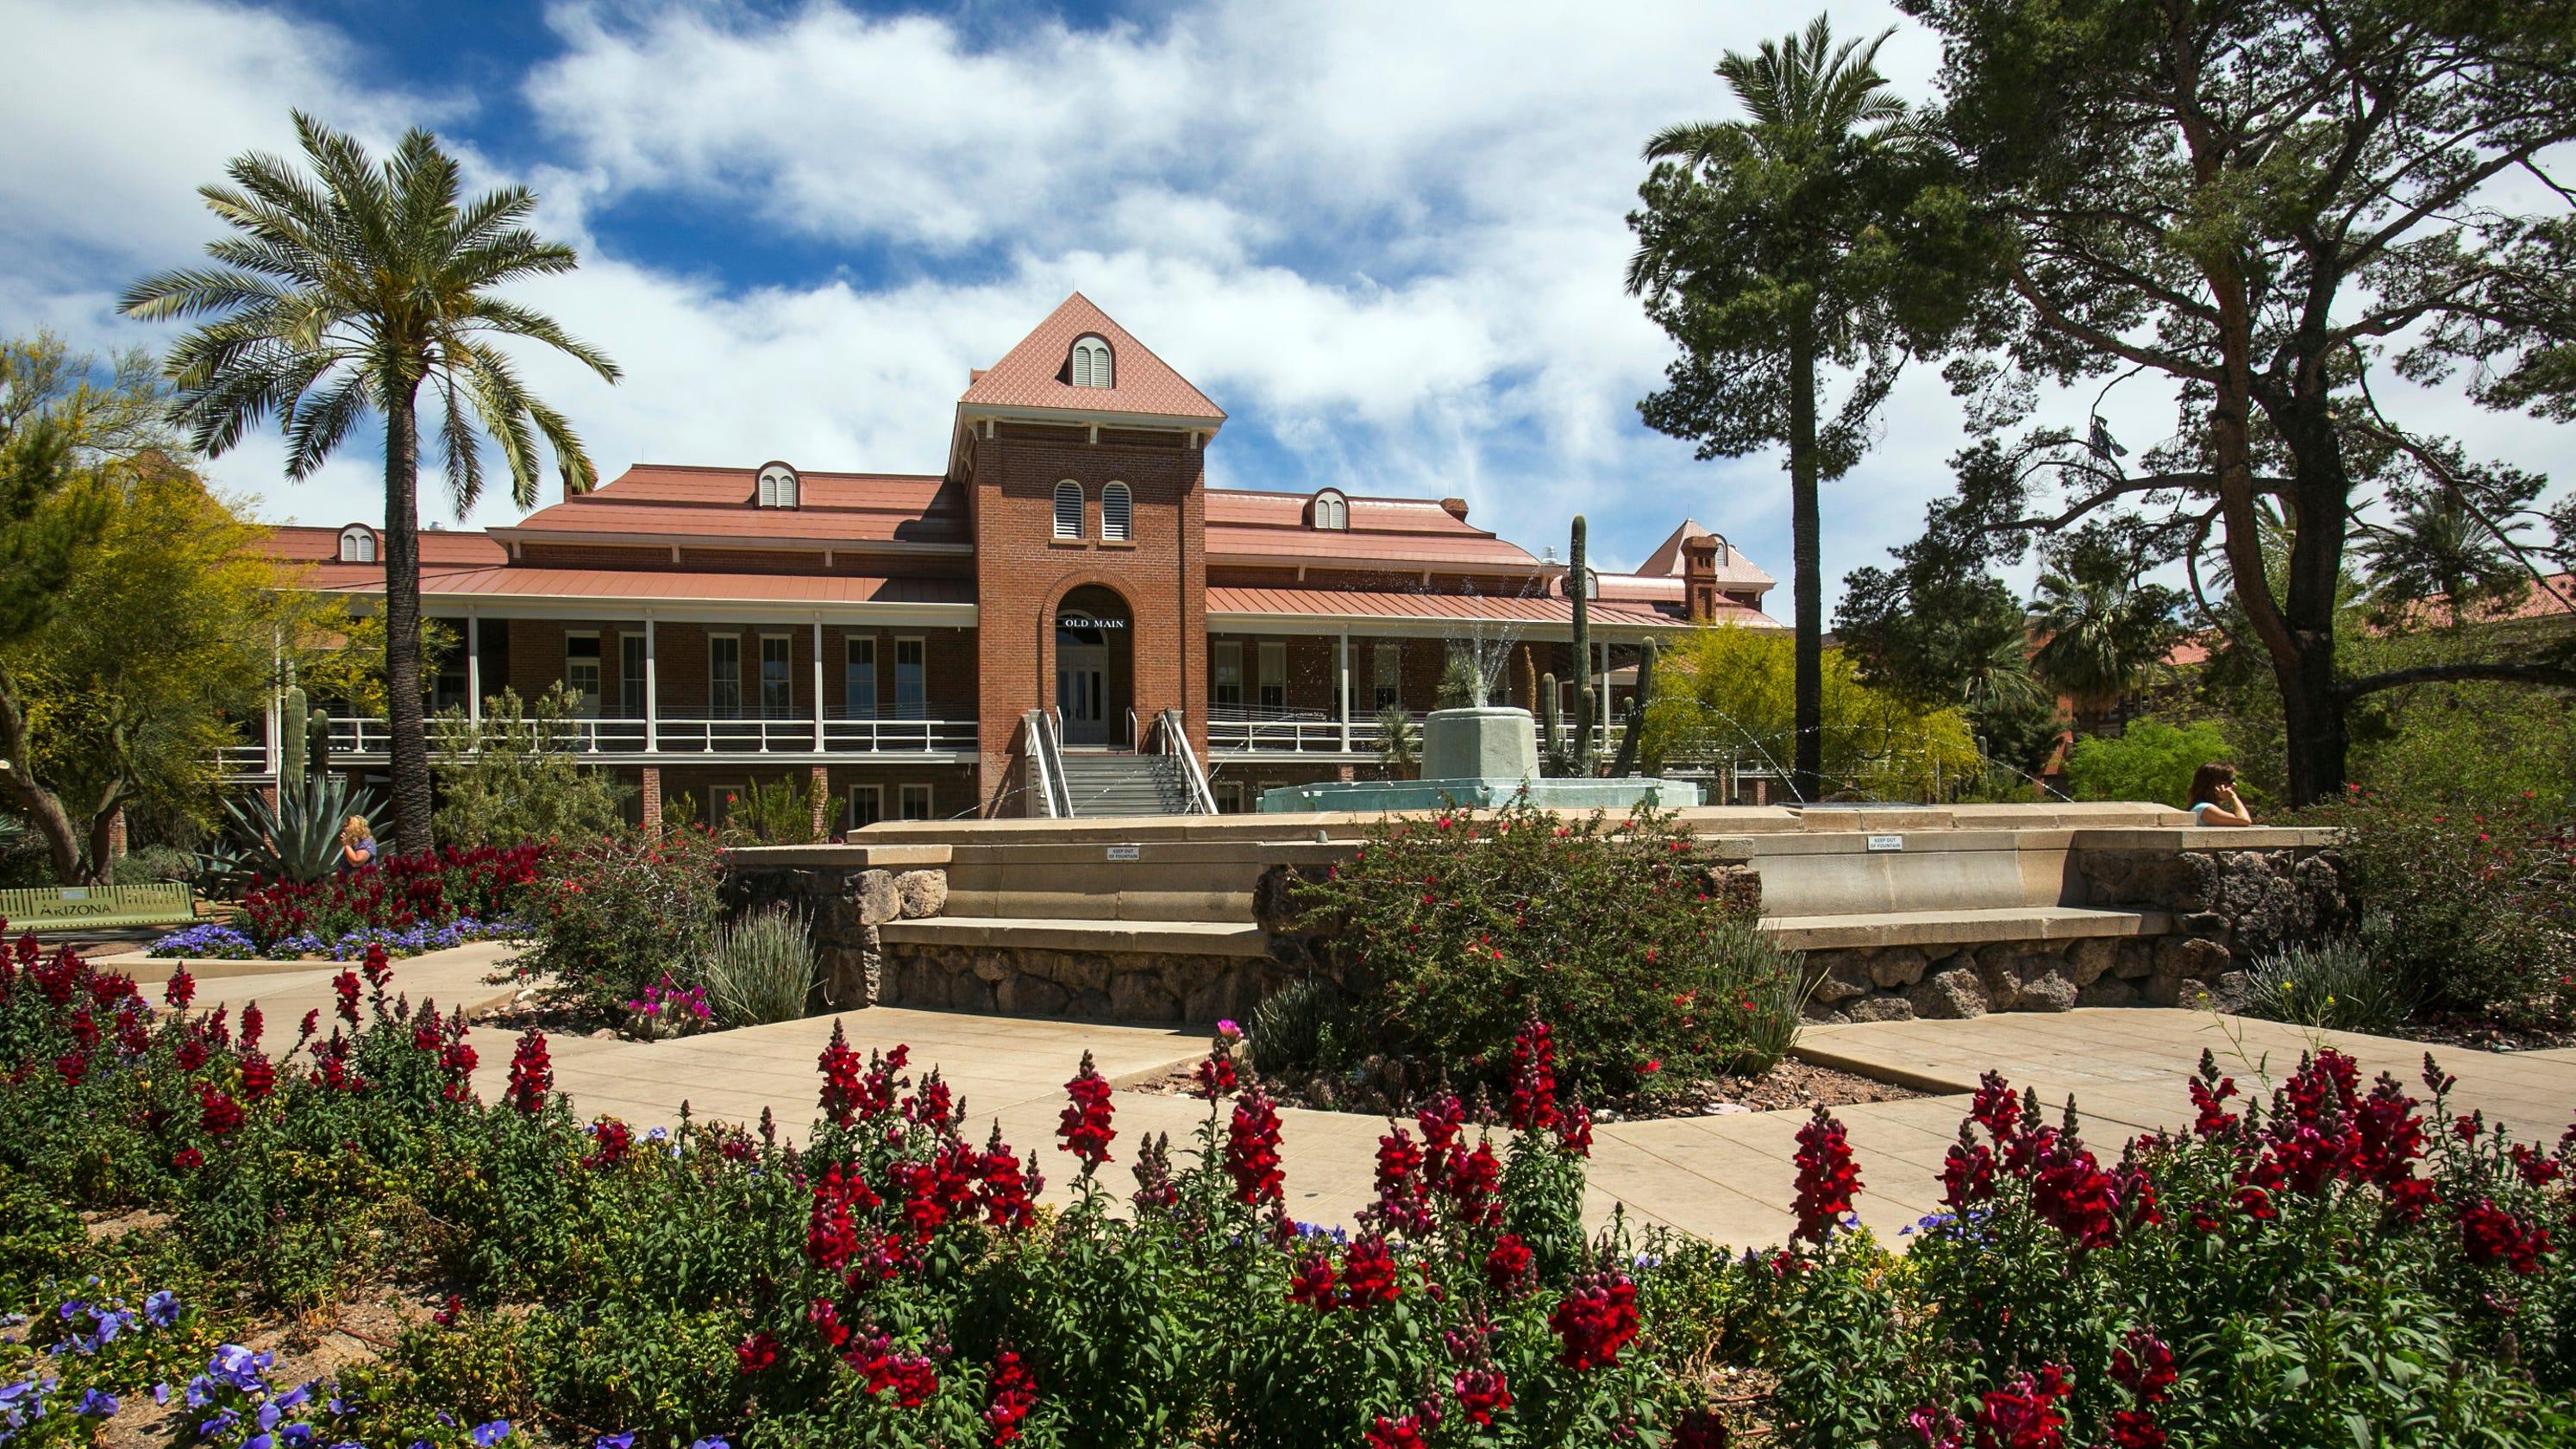 University of Arizona took $458,000 from eugenics group Pioneer Fund